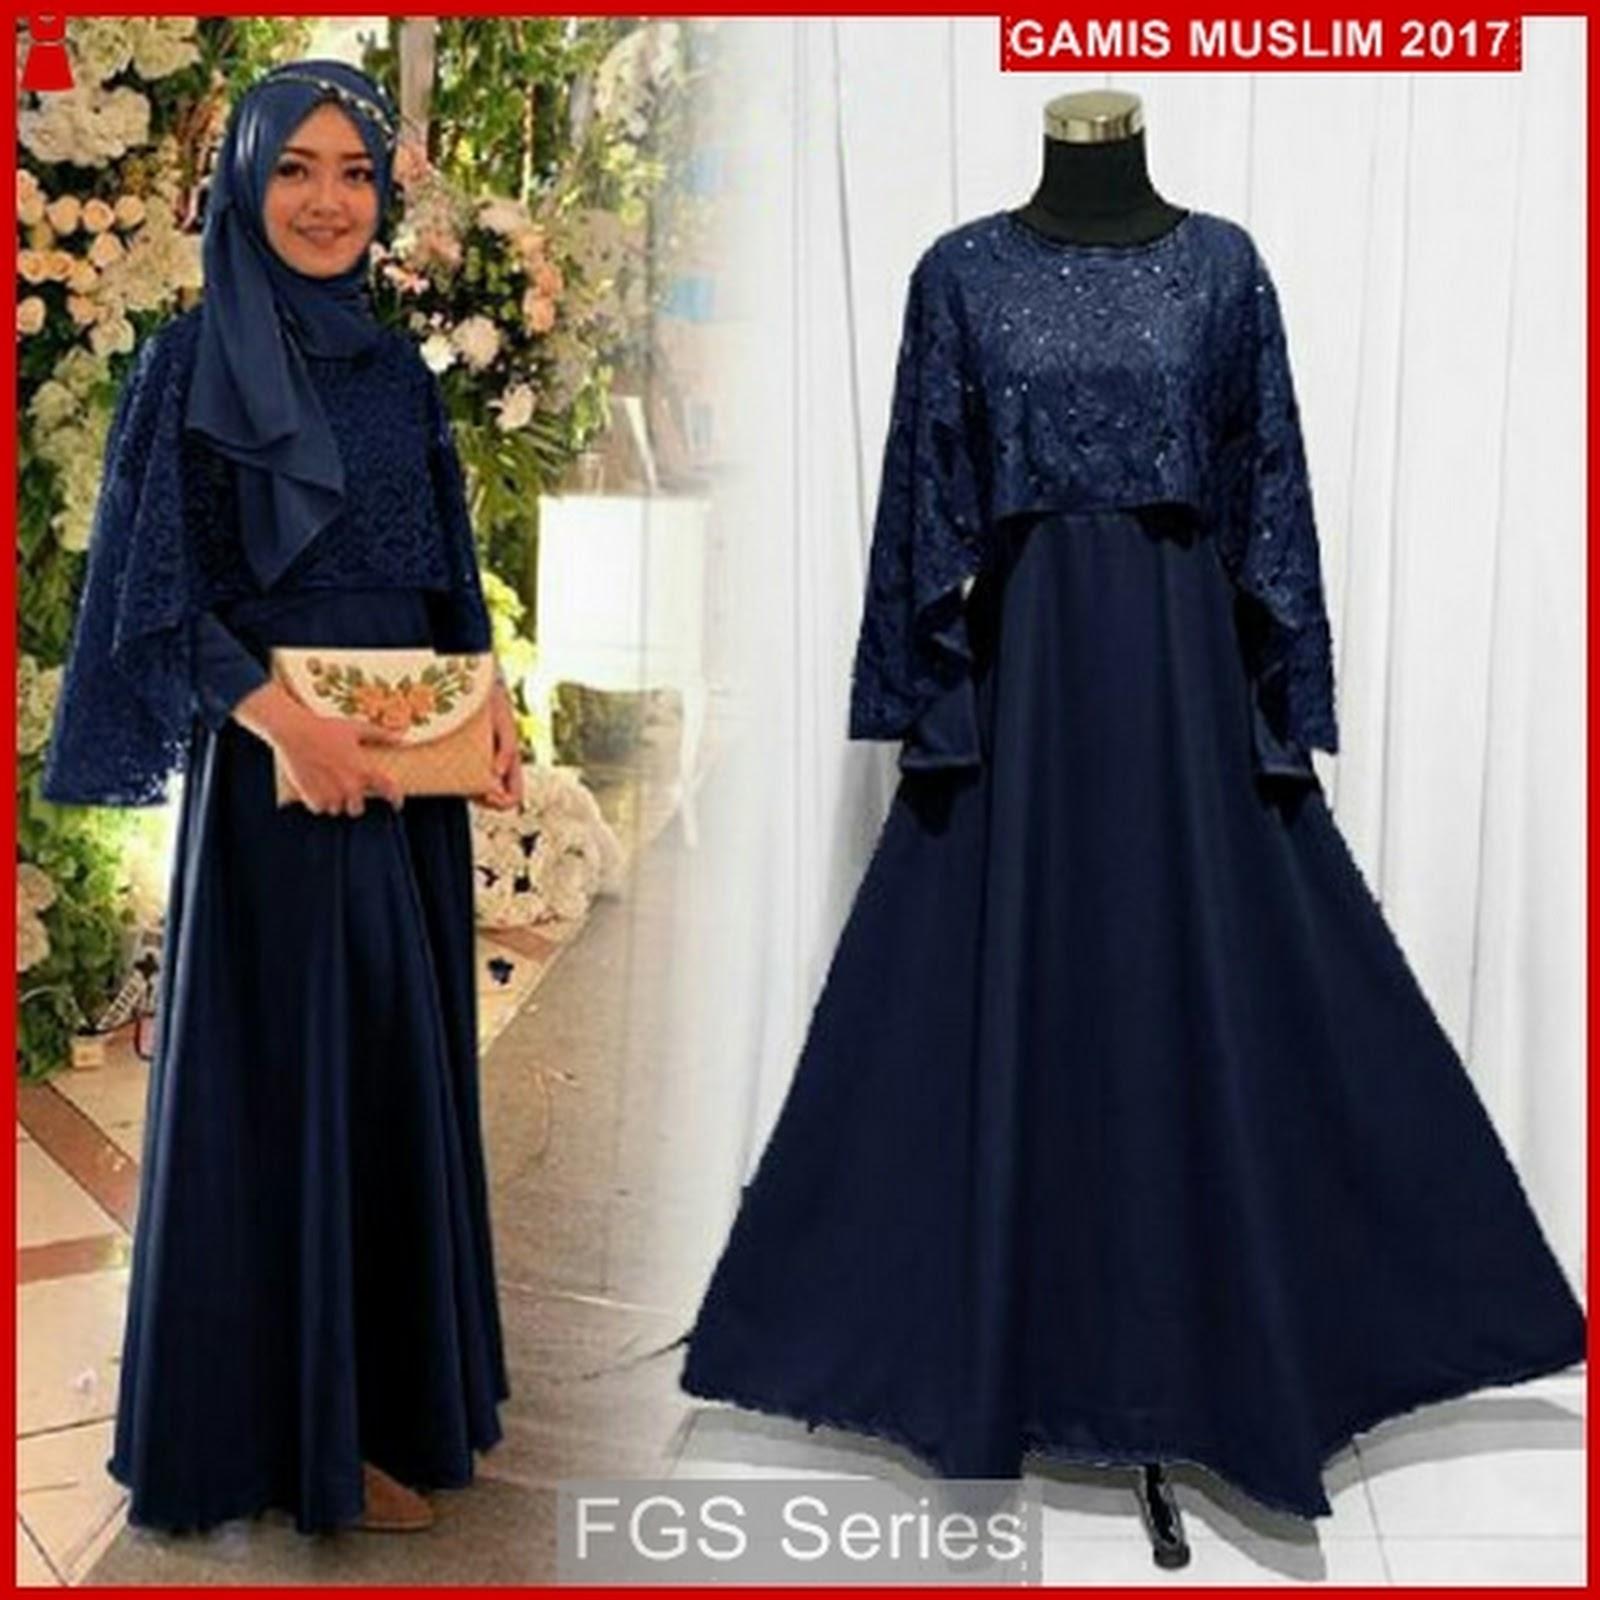 Dapatkan Baju Muslim Lebaran Paling Keren Terbaru Di BMG b459efcf57